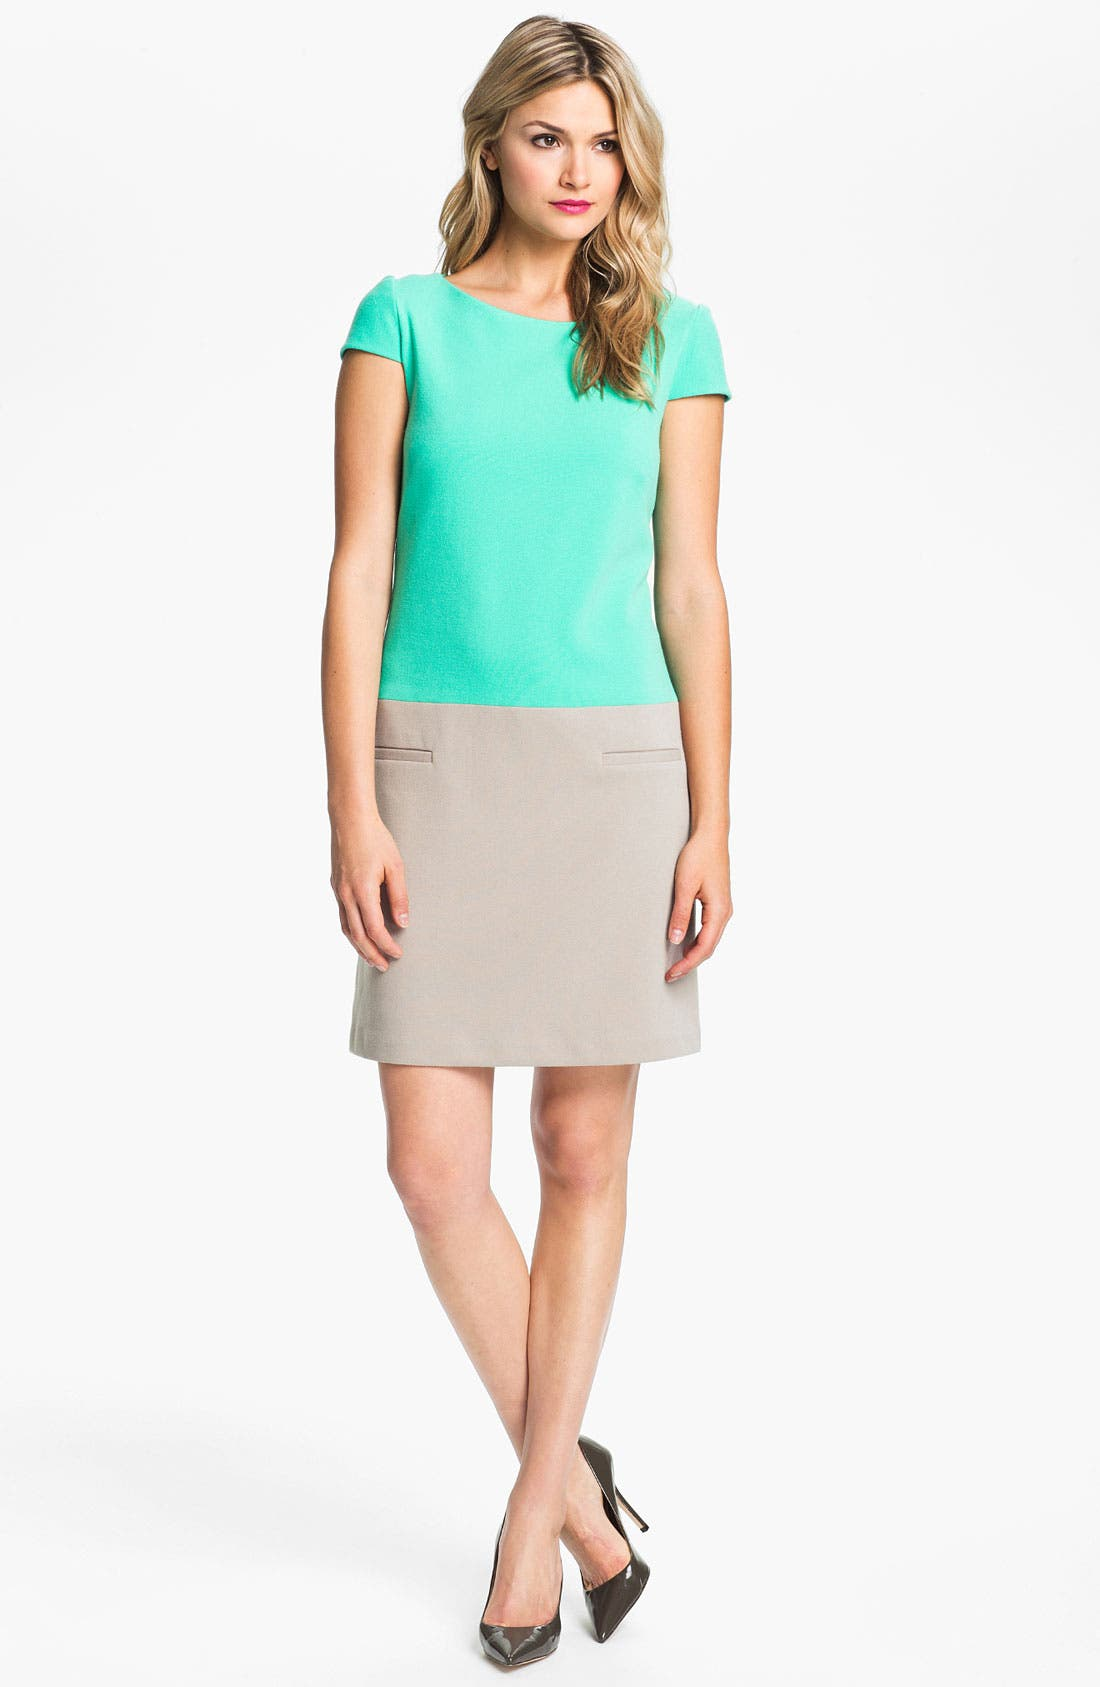 Alternate Image 1 Selected - Eliza J Colorblock Shift Dress